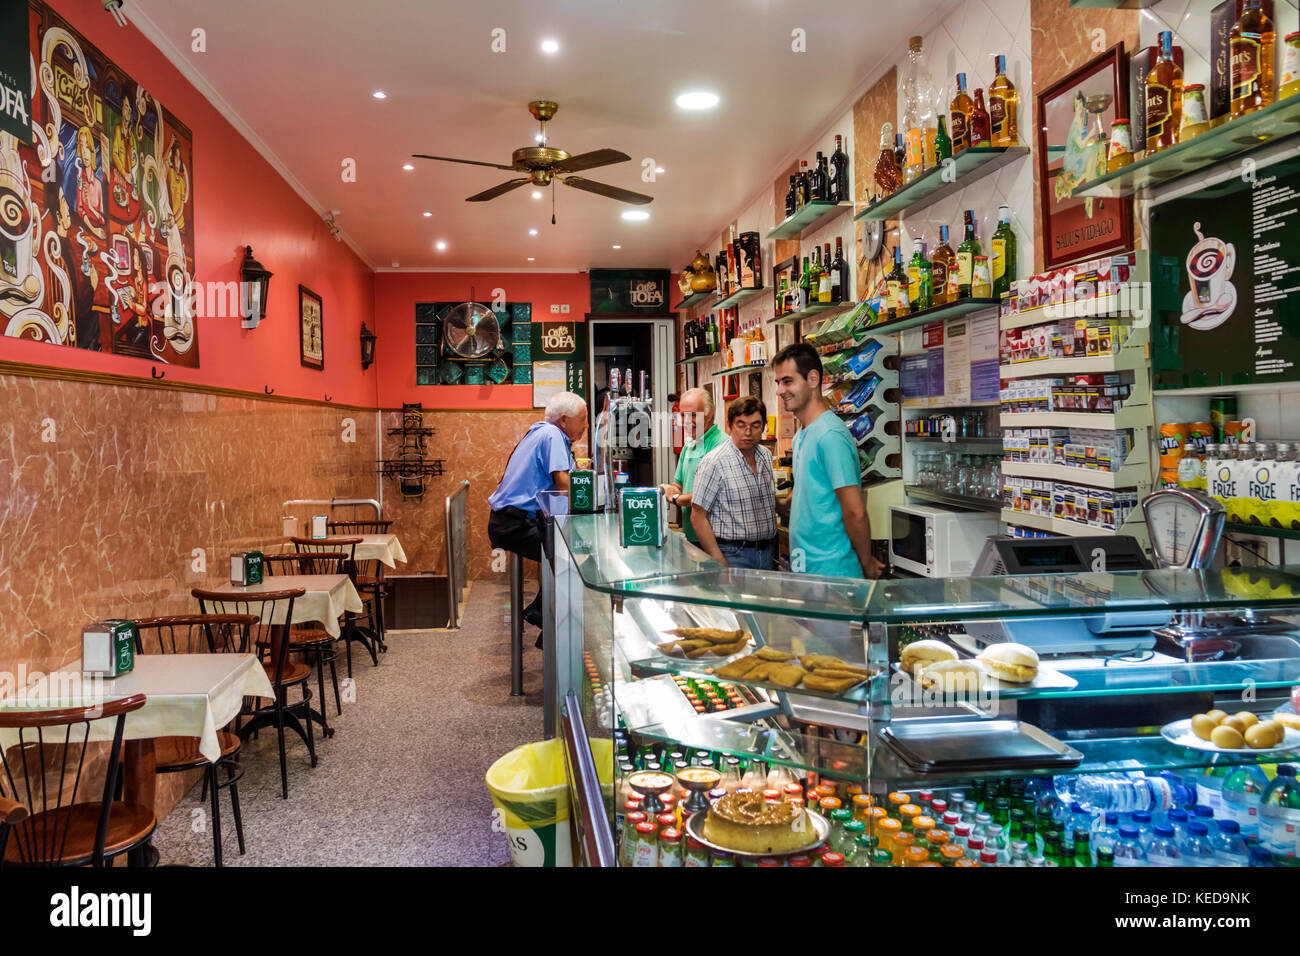 Lisbon Portugal cafe neighborhood restaurant counter man server casual interior - Stock Image